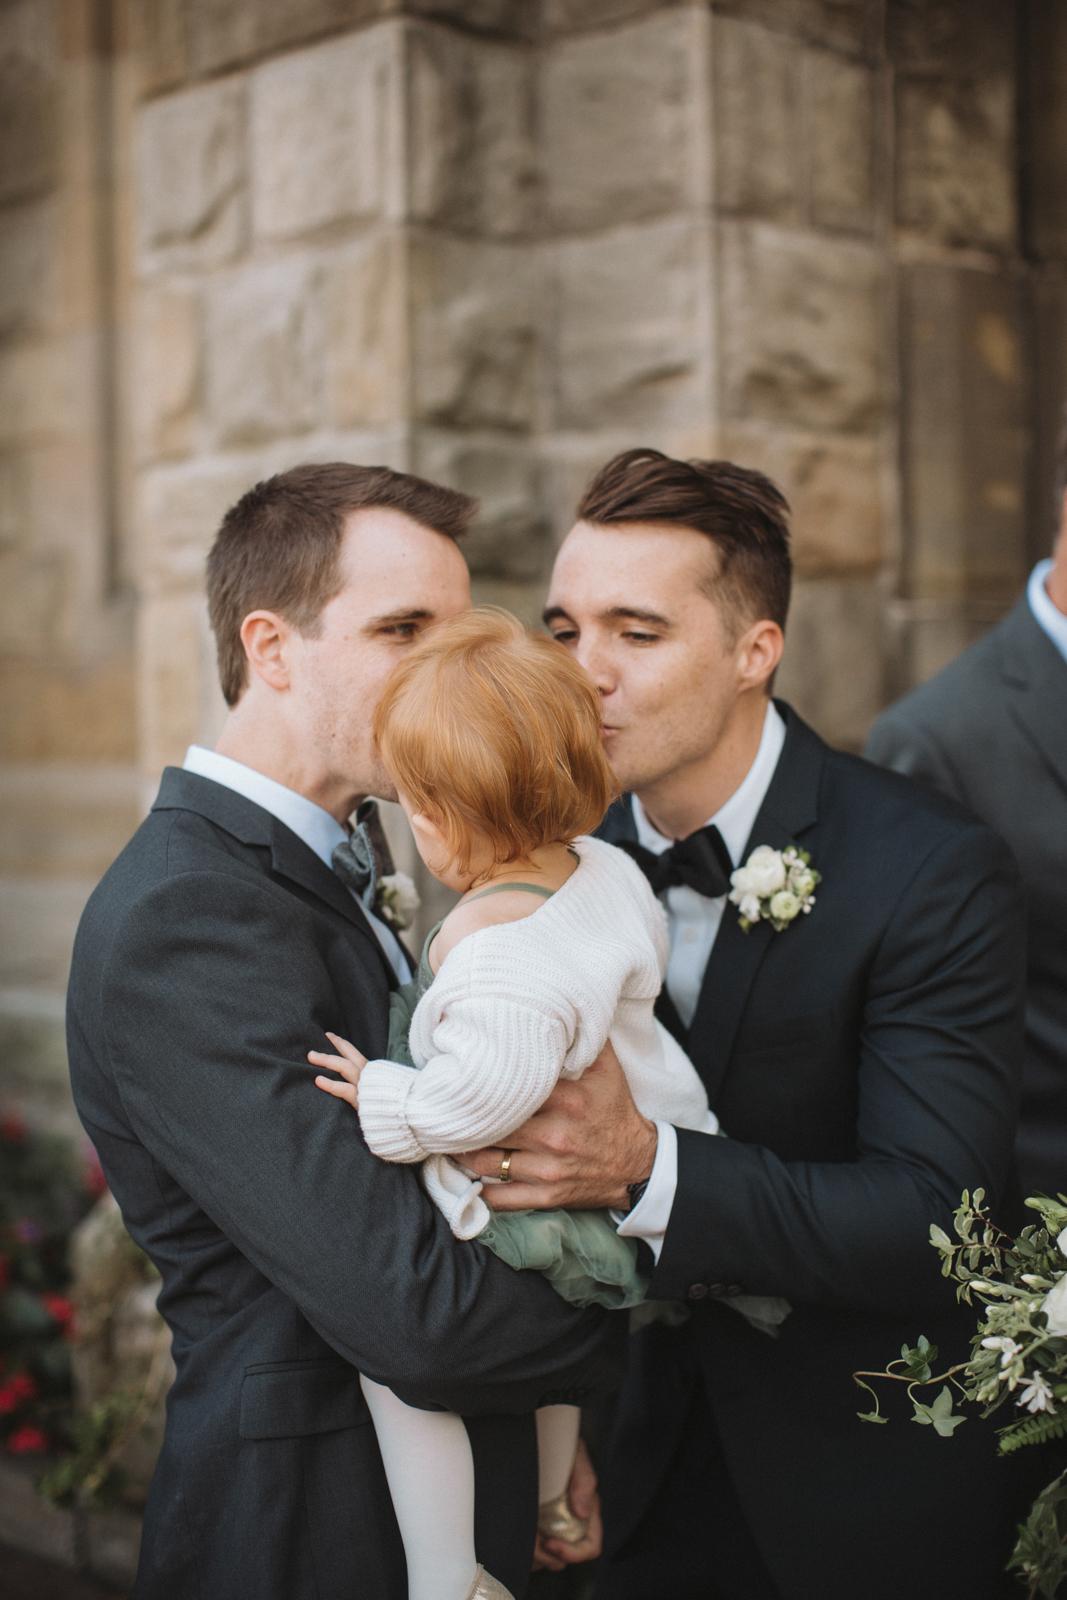 BeanandCole.com-Chris&JackieJohnson-Wedding-89.jpg